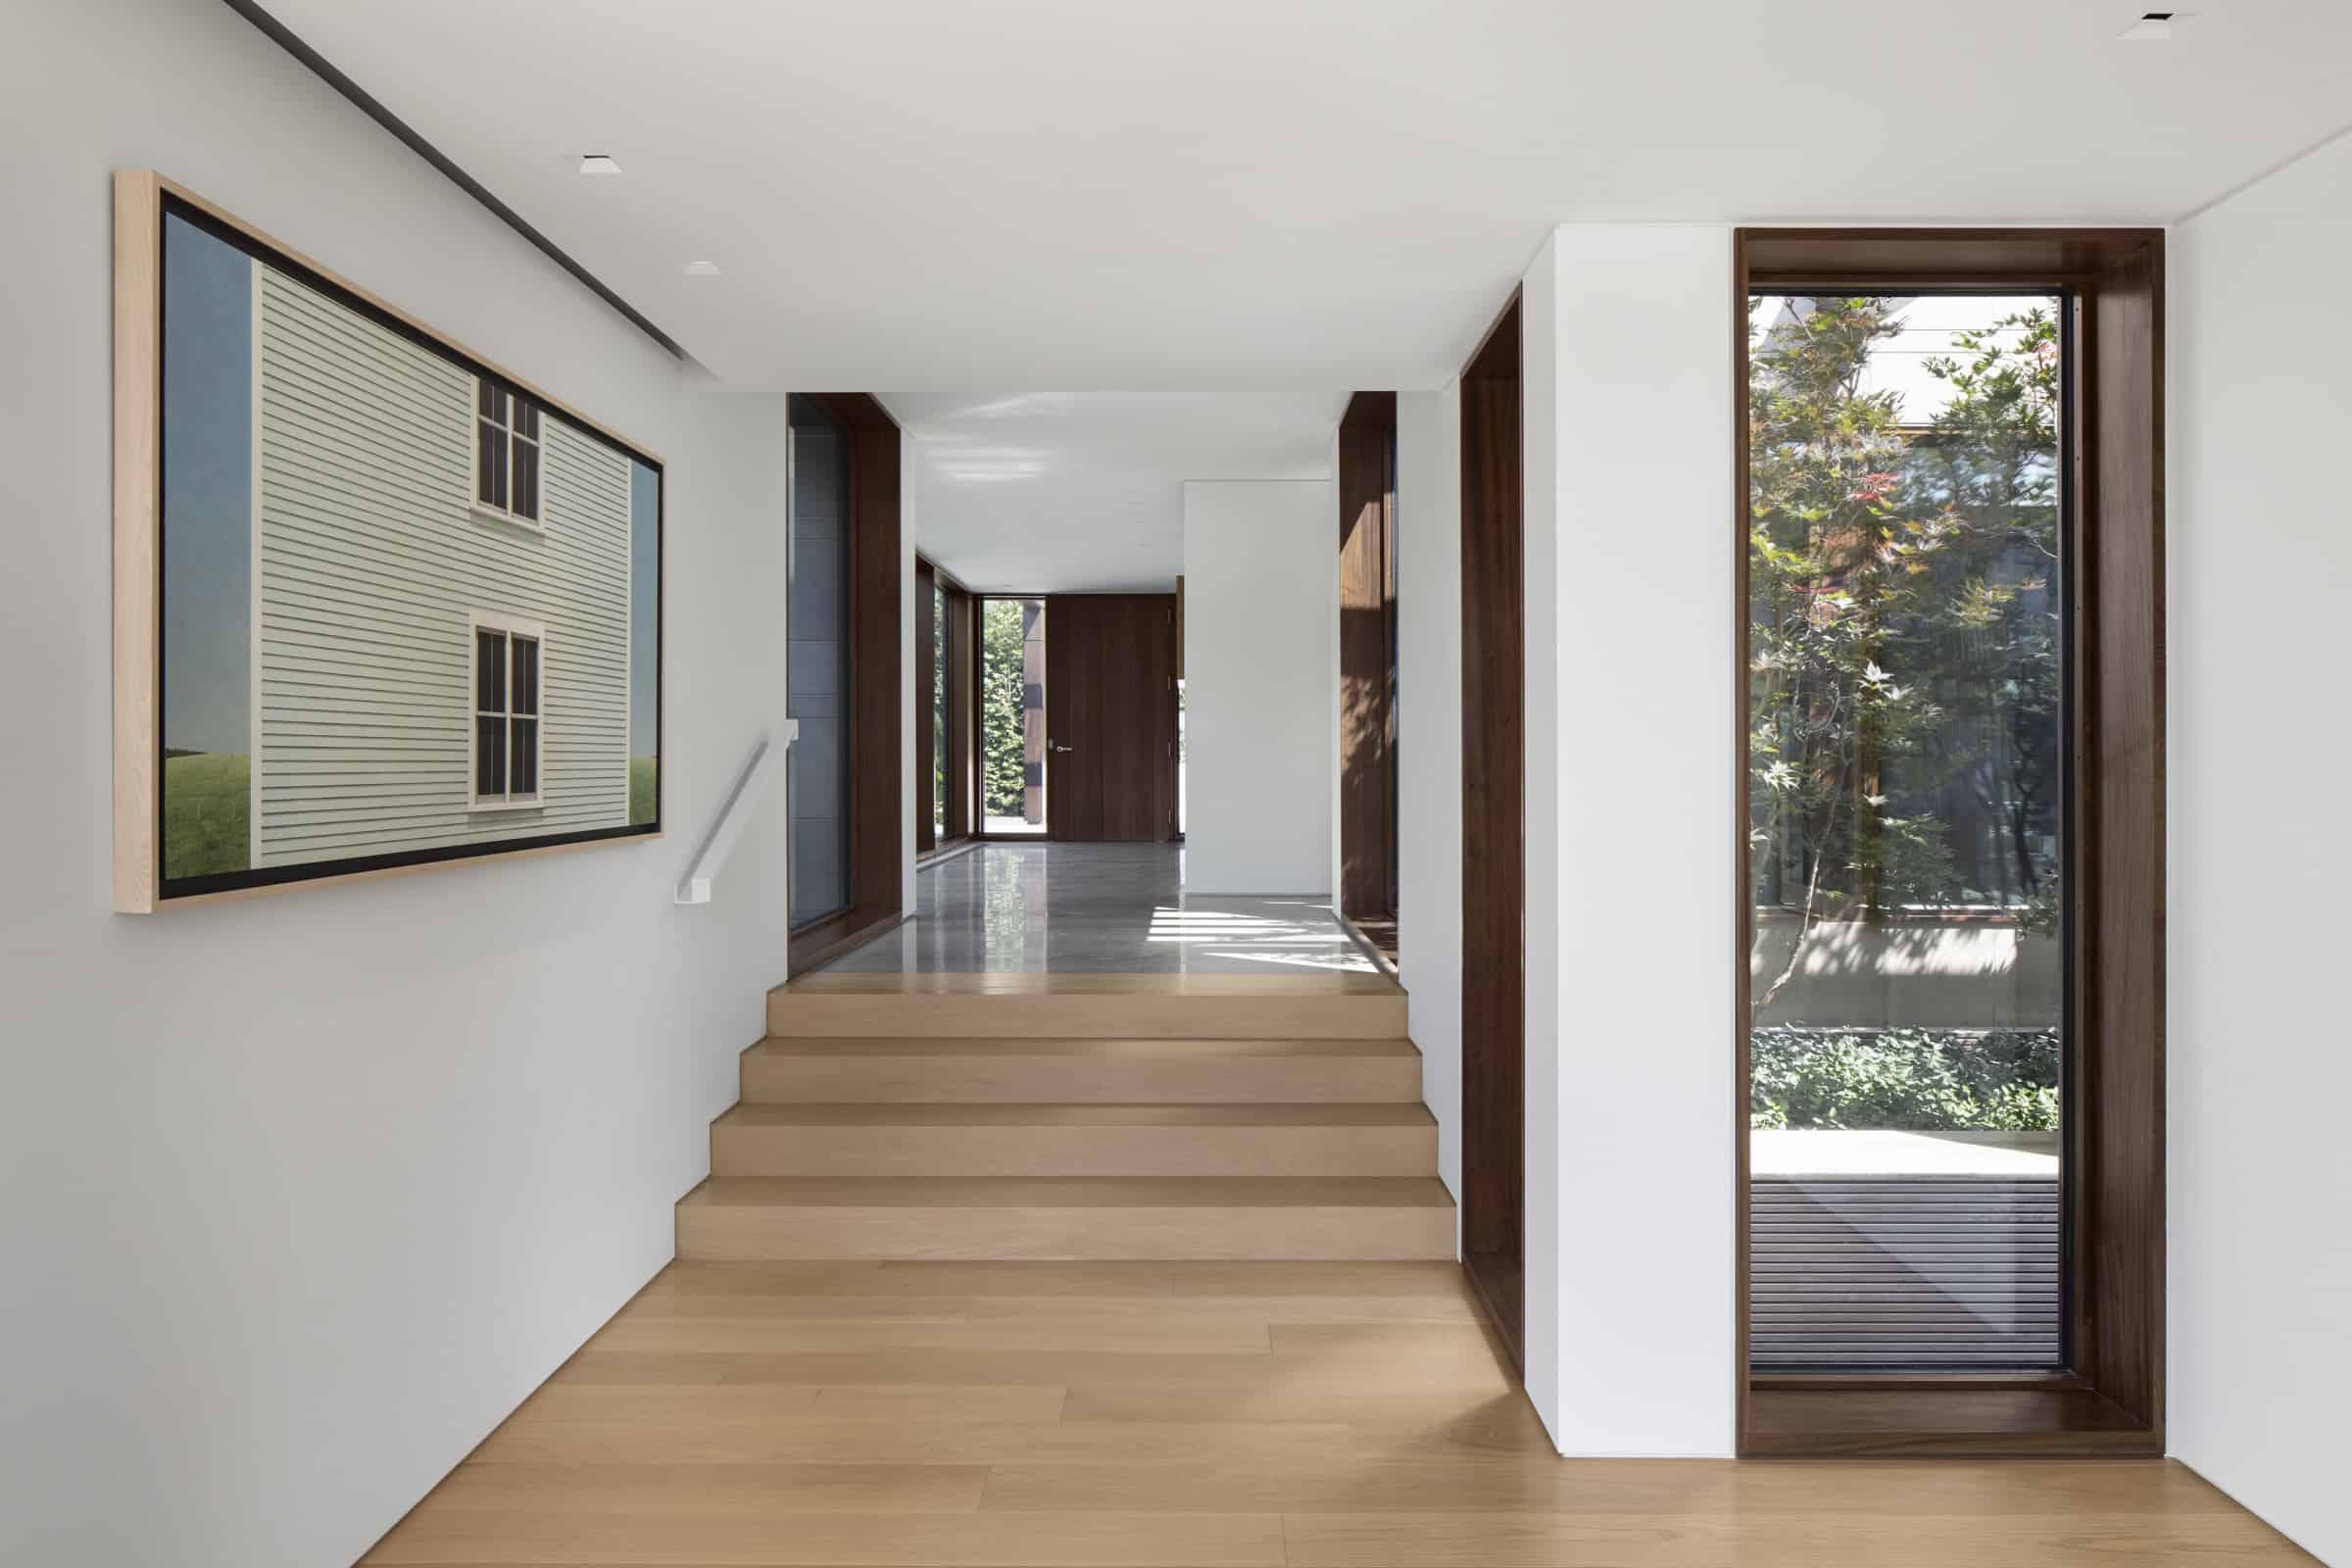 Studio Munge_Private Residence_22_Adrien Williams_web